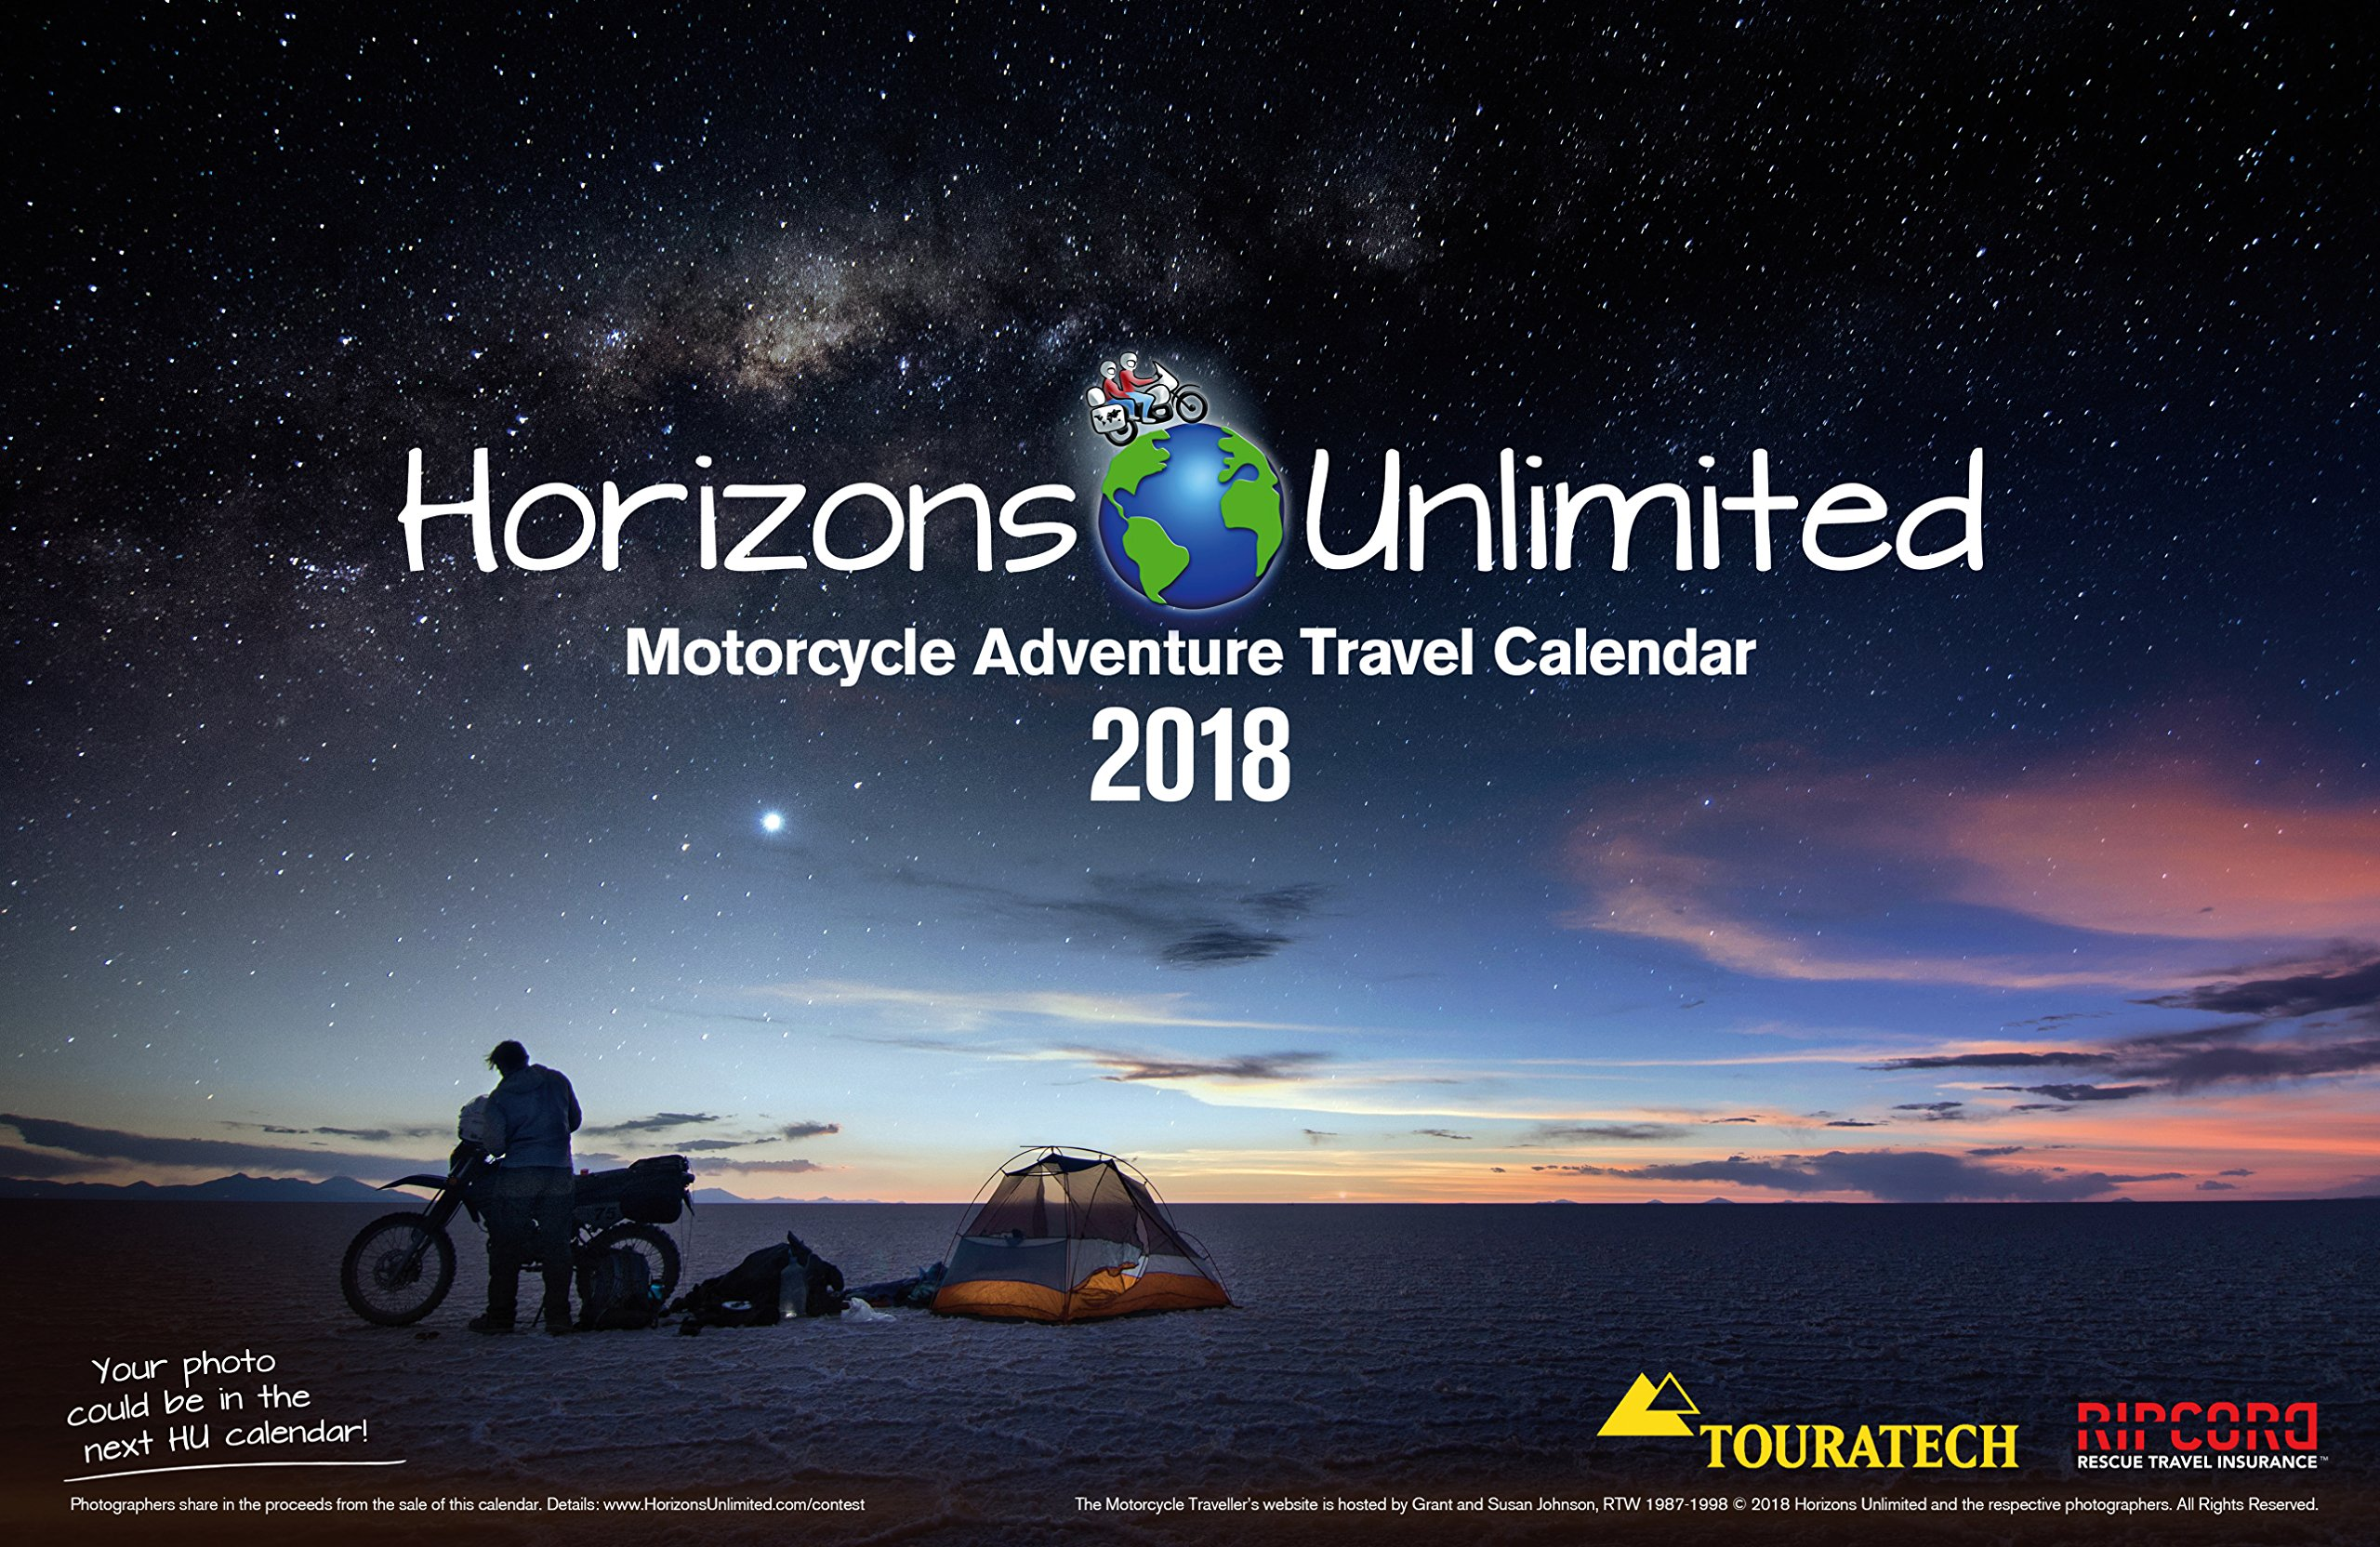 horizons-unlimited-motorcycle-adventure-travel-calendar